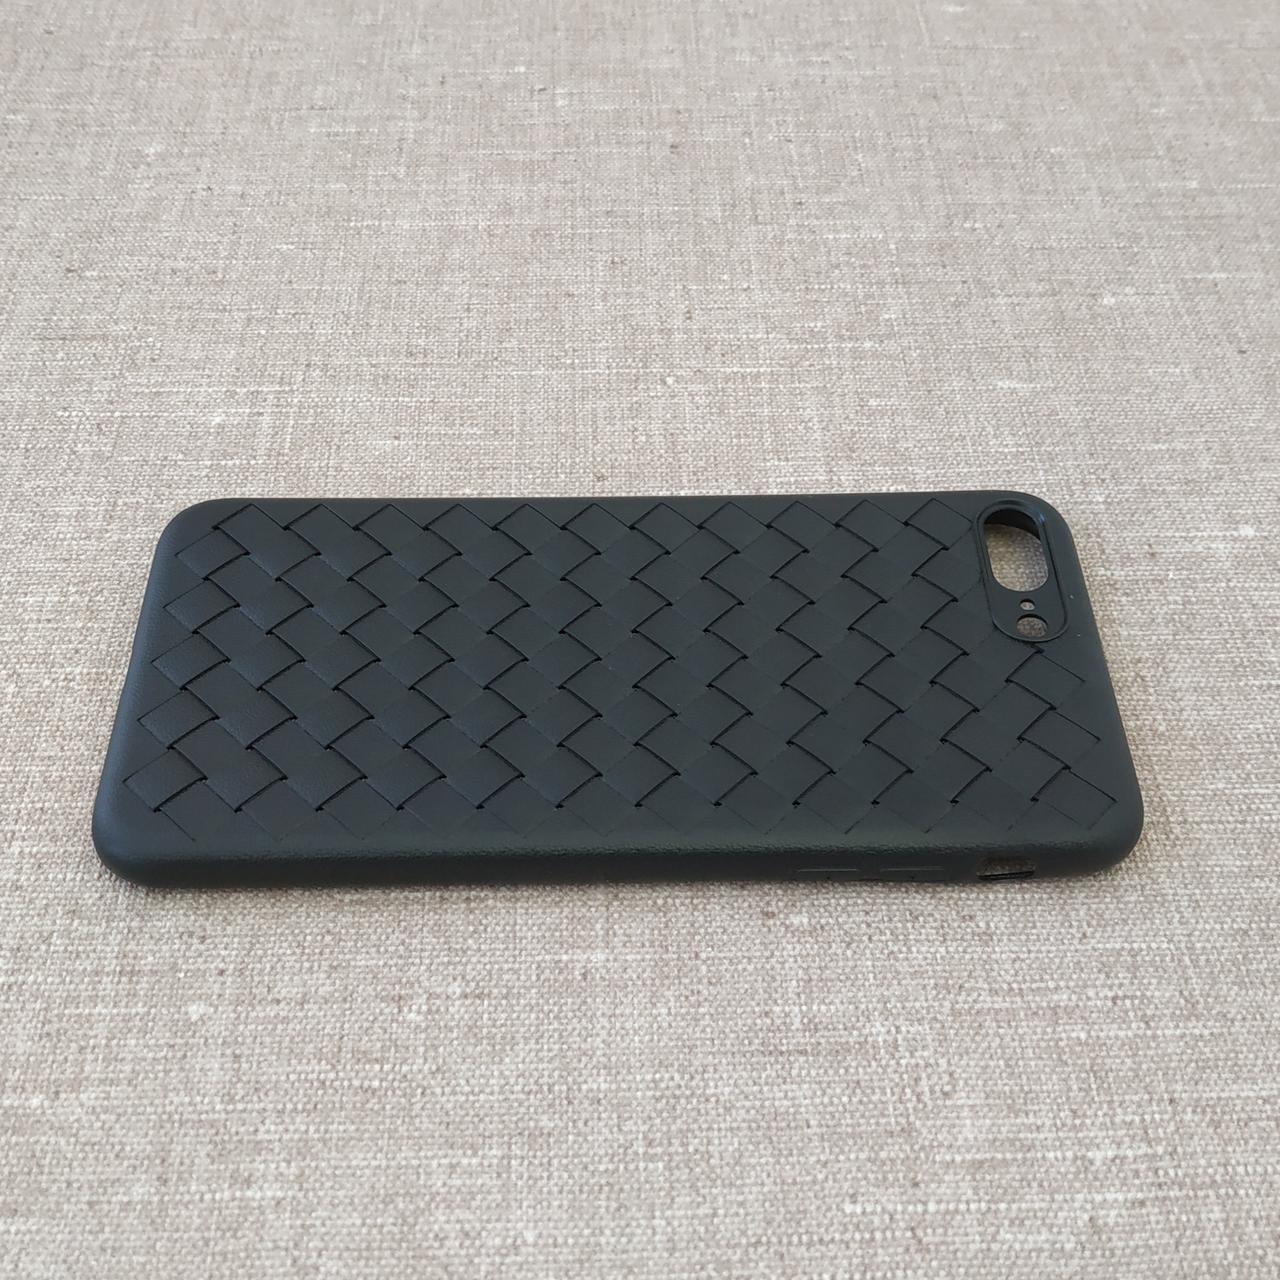 Накладка Proda Tiragor iPhone 7 Plus black Для телефона Чехол